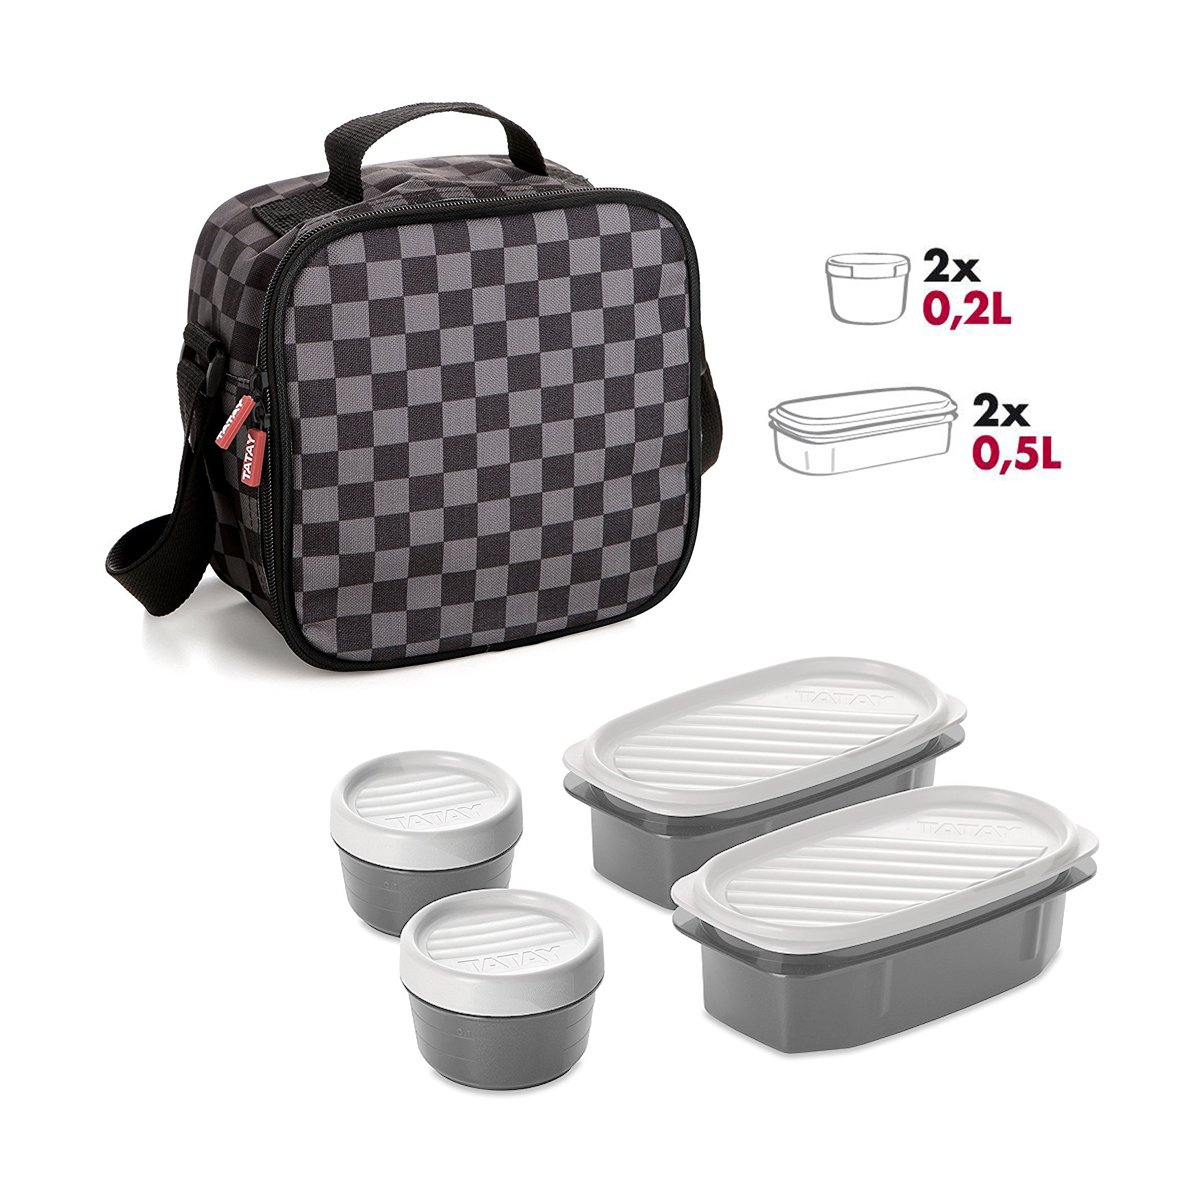 Negra Bolsa T/érmica Porta Alimentos con 4 Tapers Herm/éticos a Juego Compacta y Practica